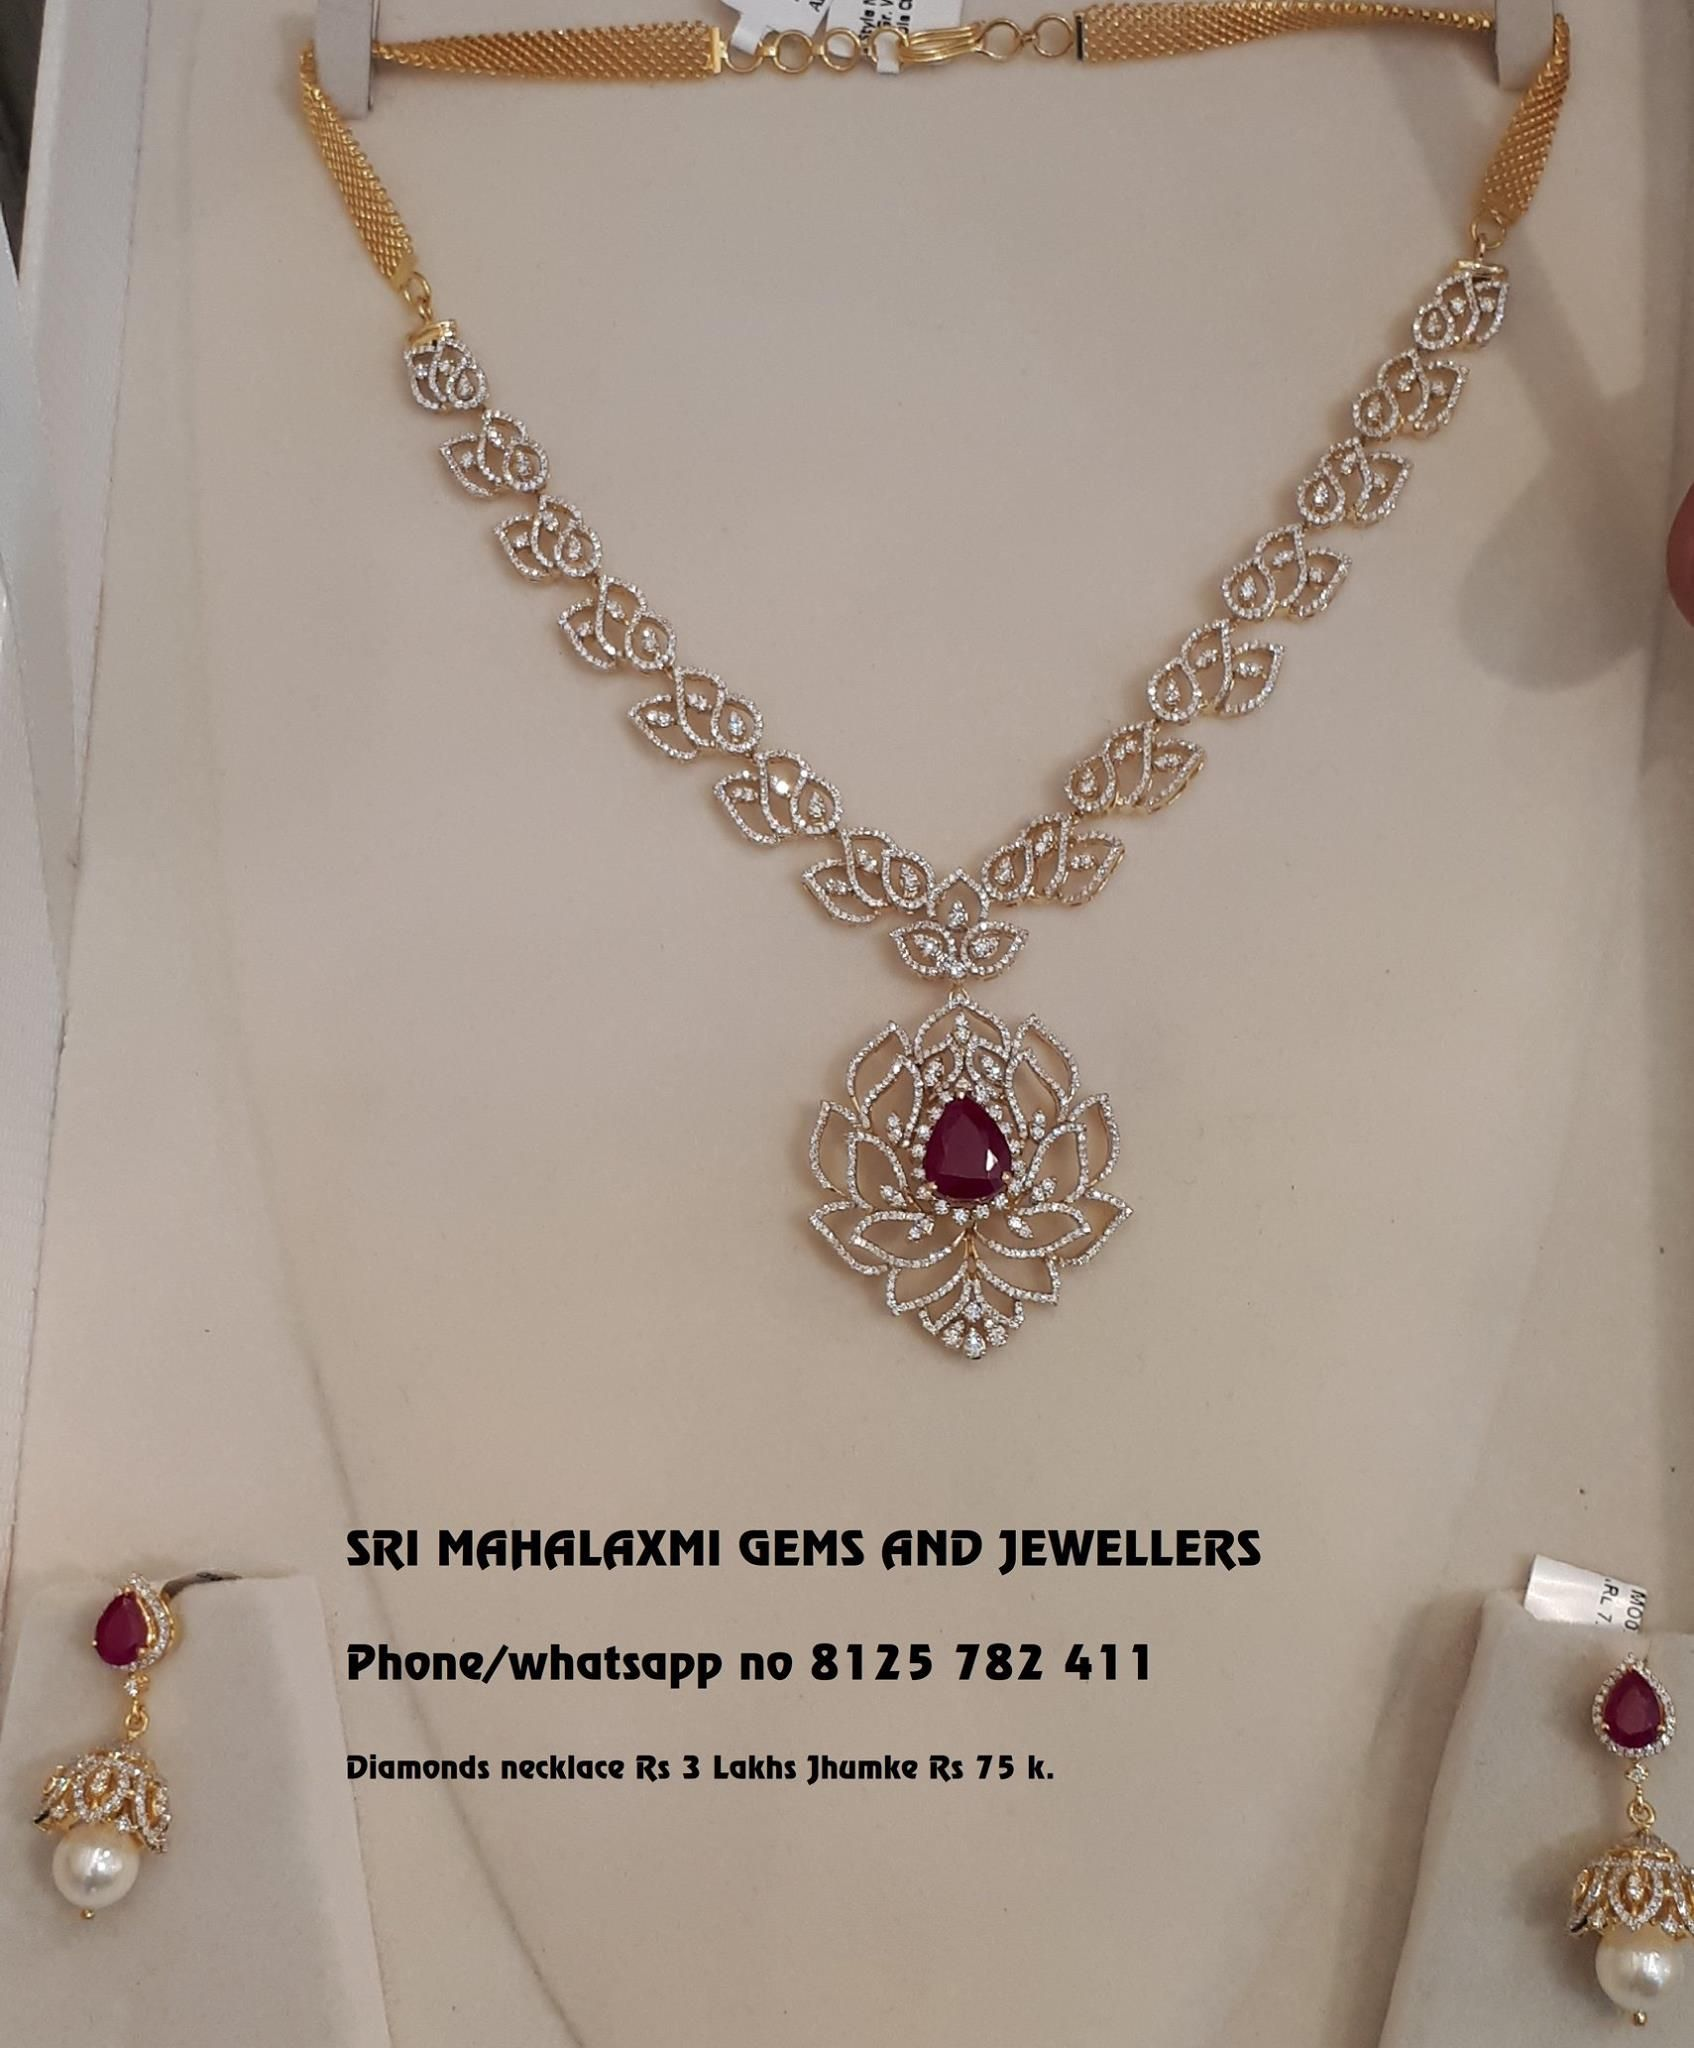 Very Light Igi Certified Vvs Ef Diamonds Necklace Rs 3 Lakhs Plus Jhumke R Gold Necklace Indian Bridal Jewelry Diamond Necklace Indian Diamond Necklace Designs